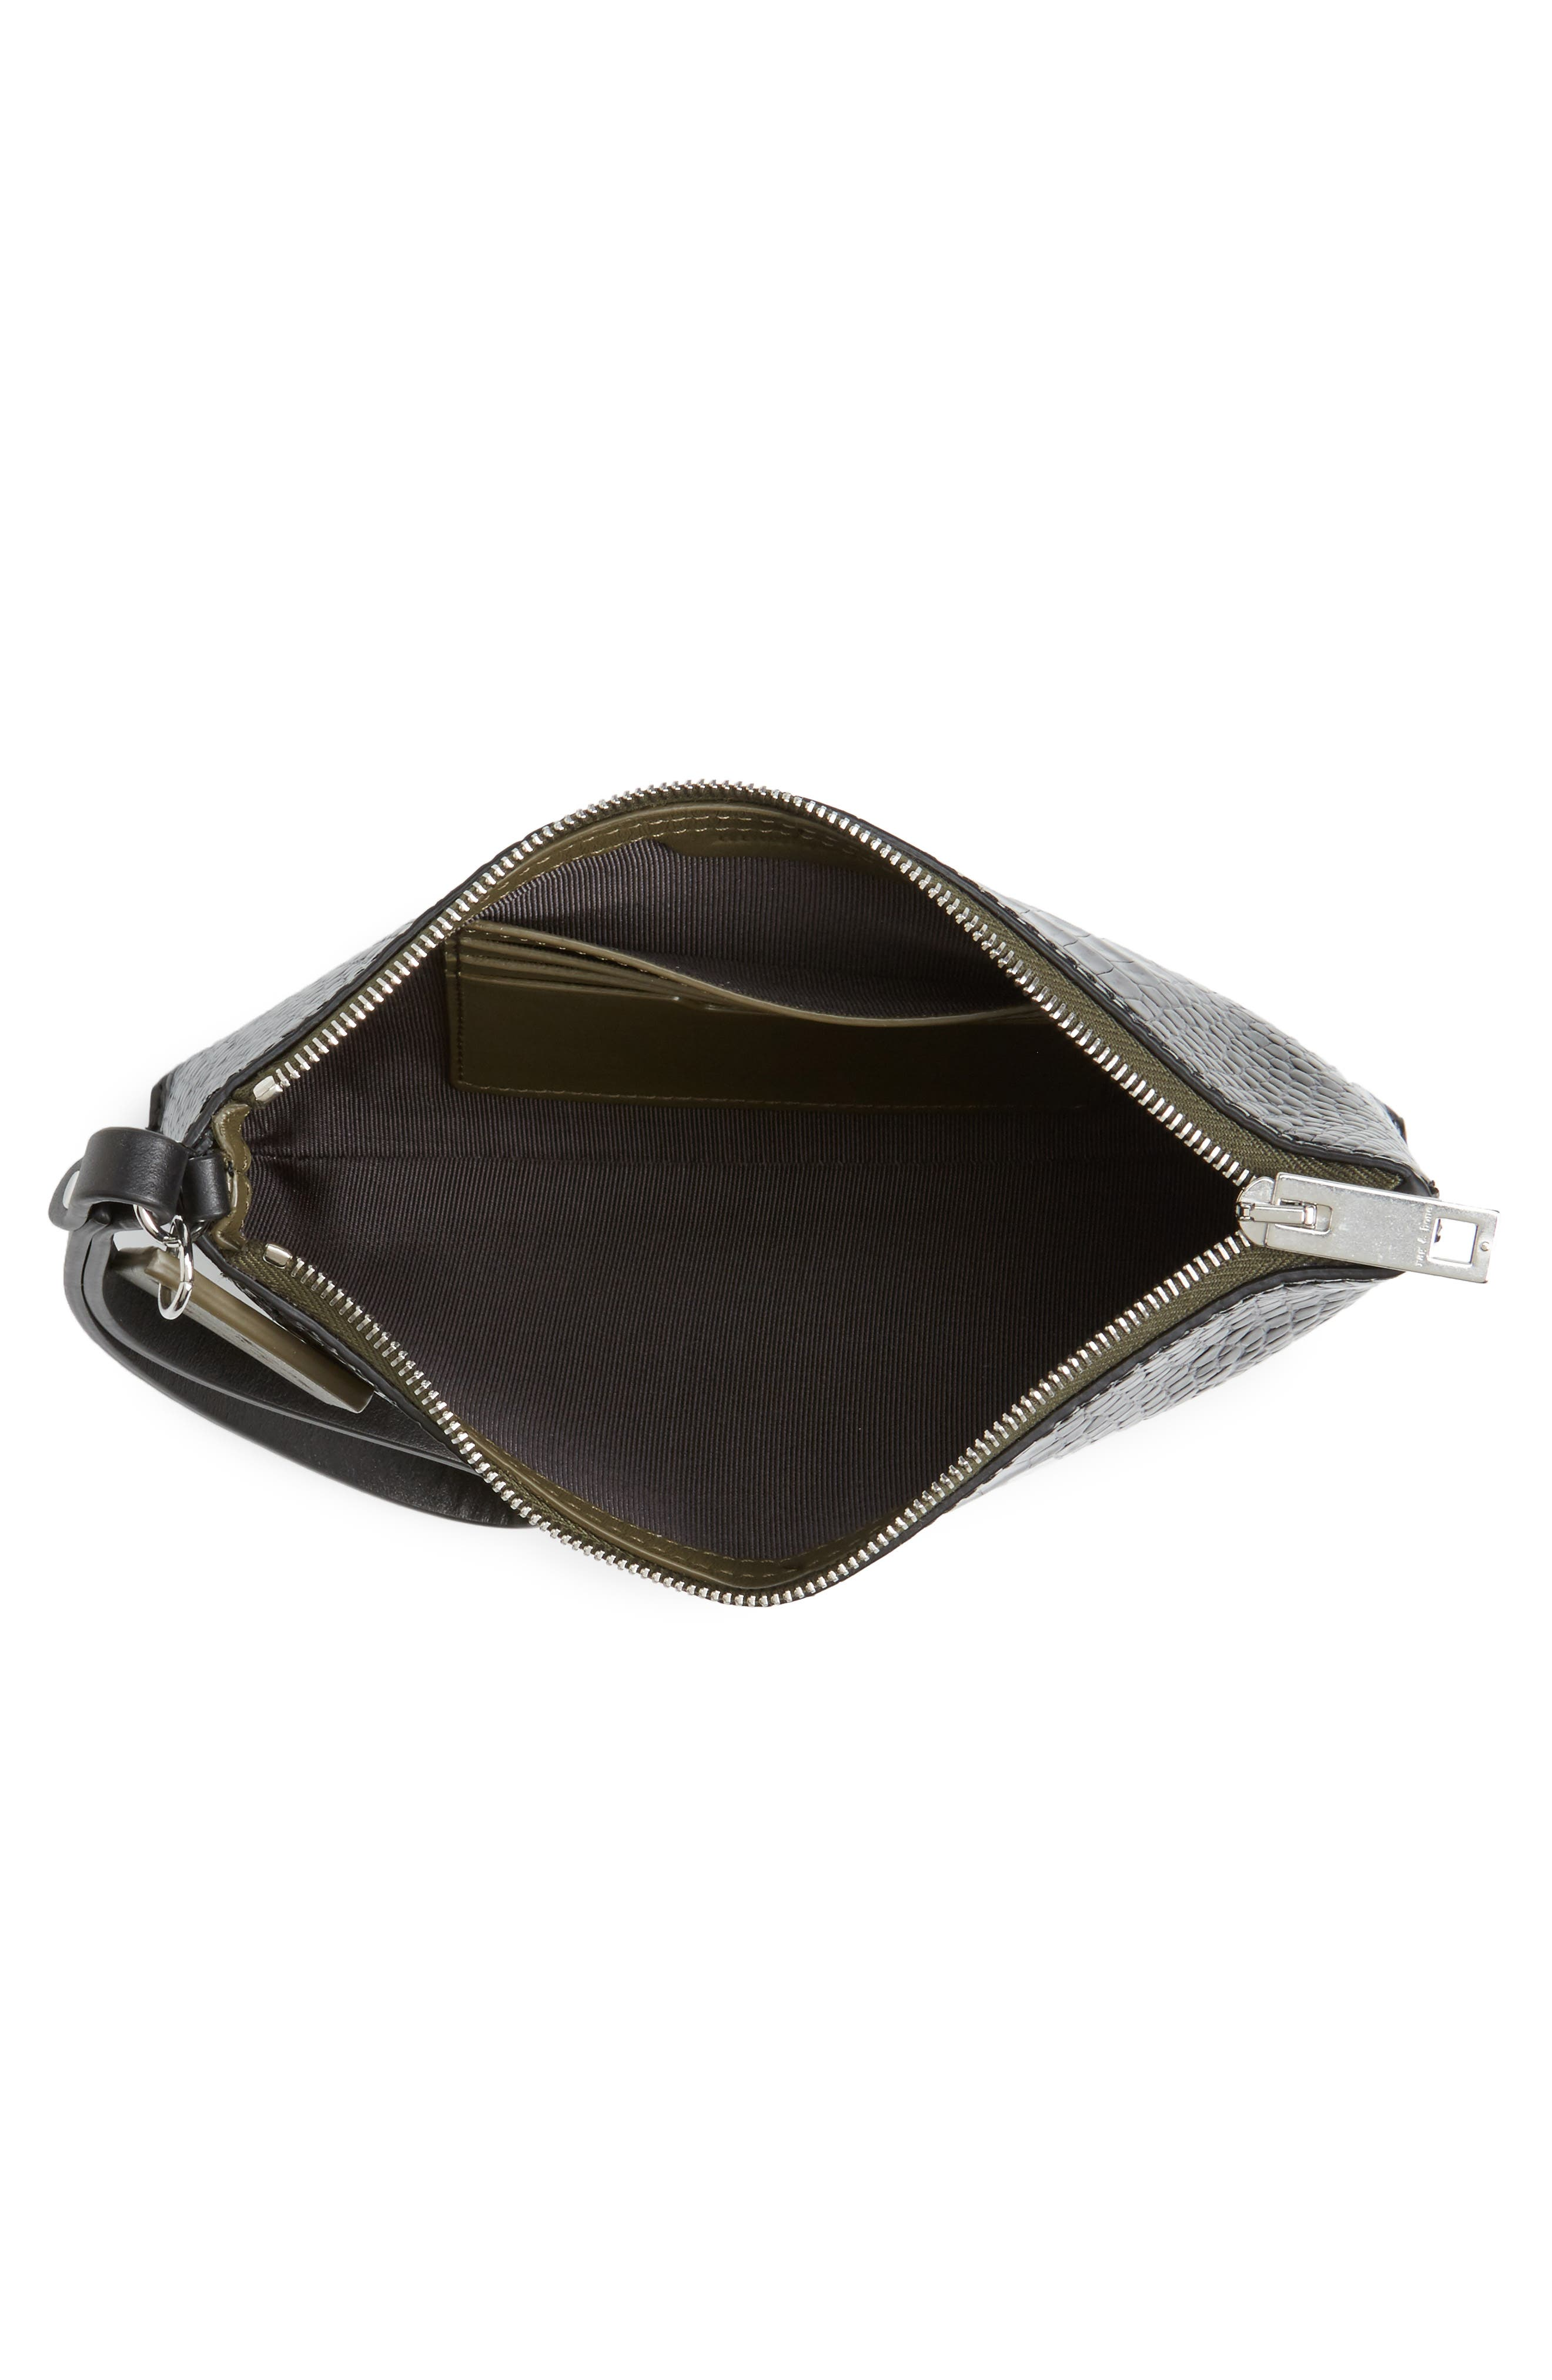 Croc Embossed Leather Wristlet,                             Alternate thumbnail 4, color,                             Black Croco